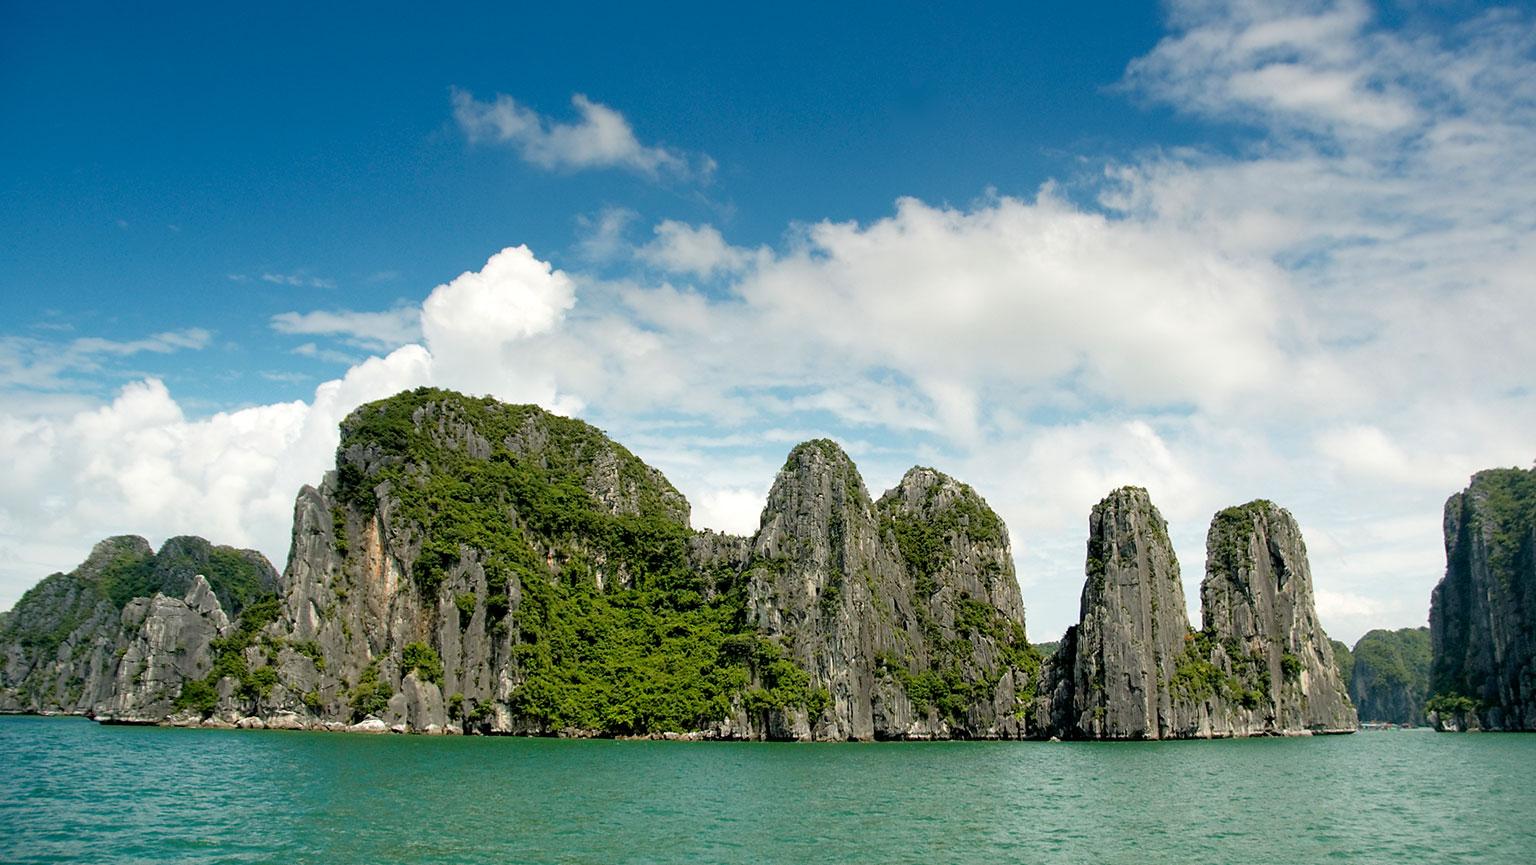 Ha Long Bay—Dramatic Karst Landscapes